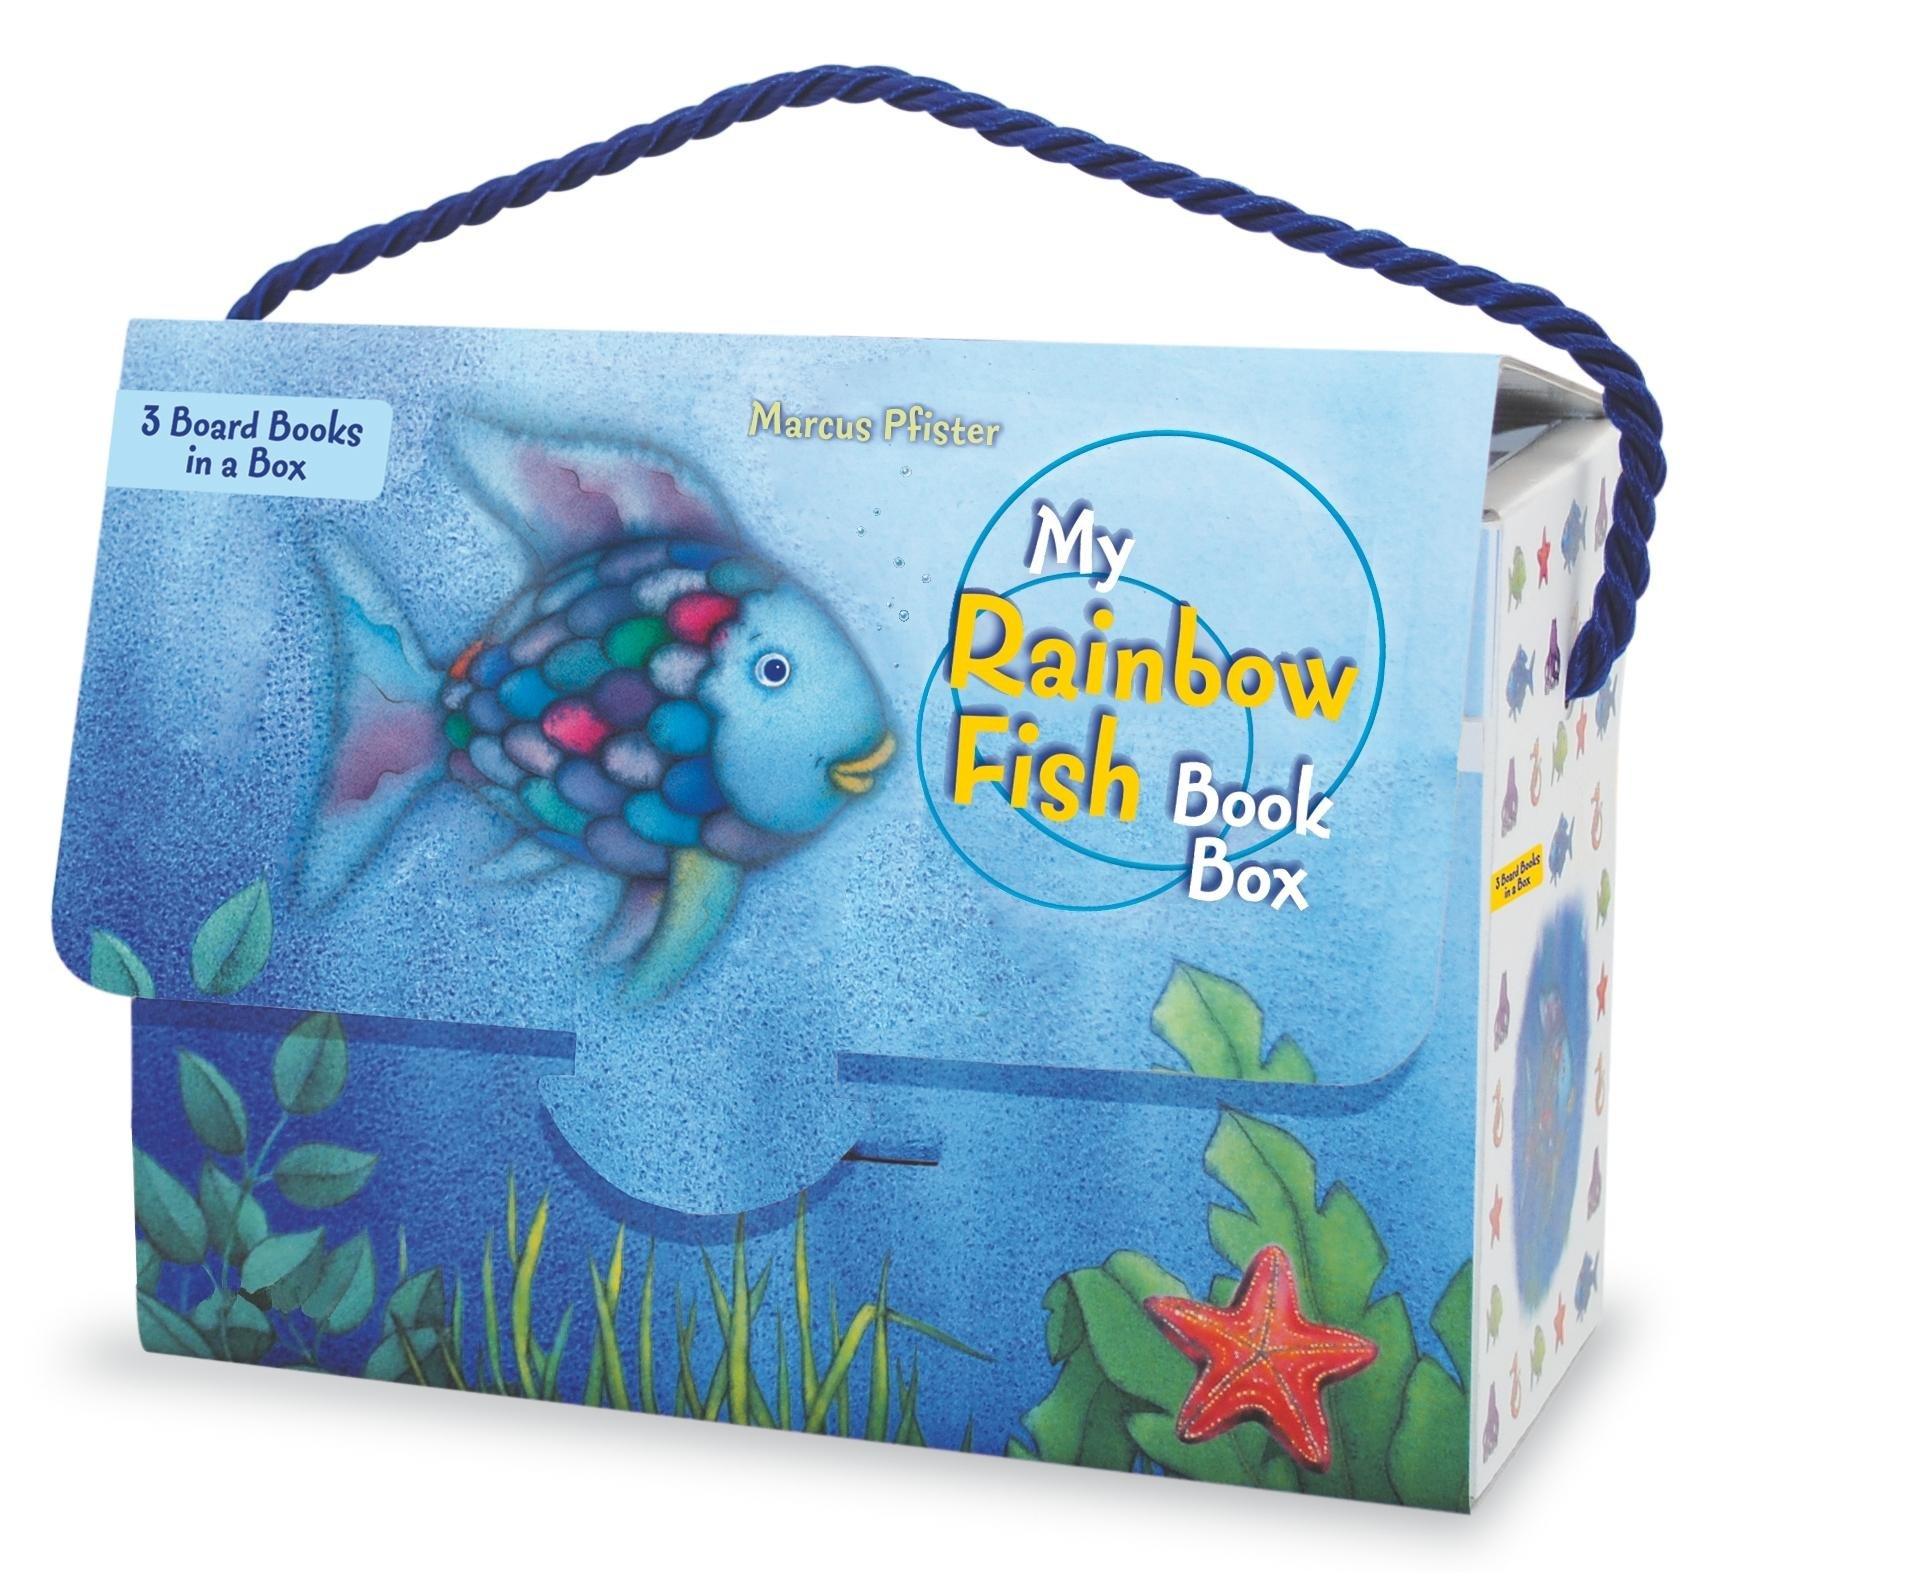 my rainbow fish book box marcus pfister